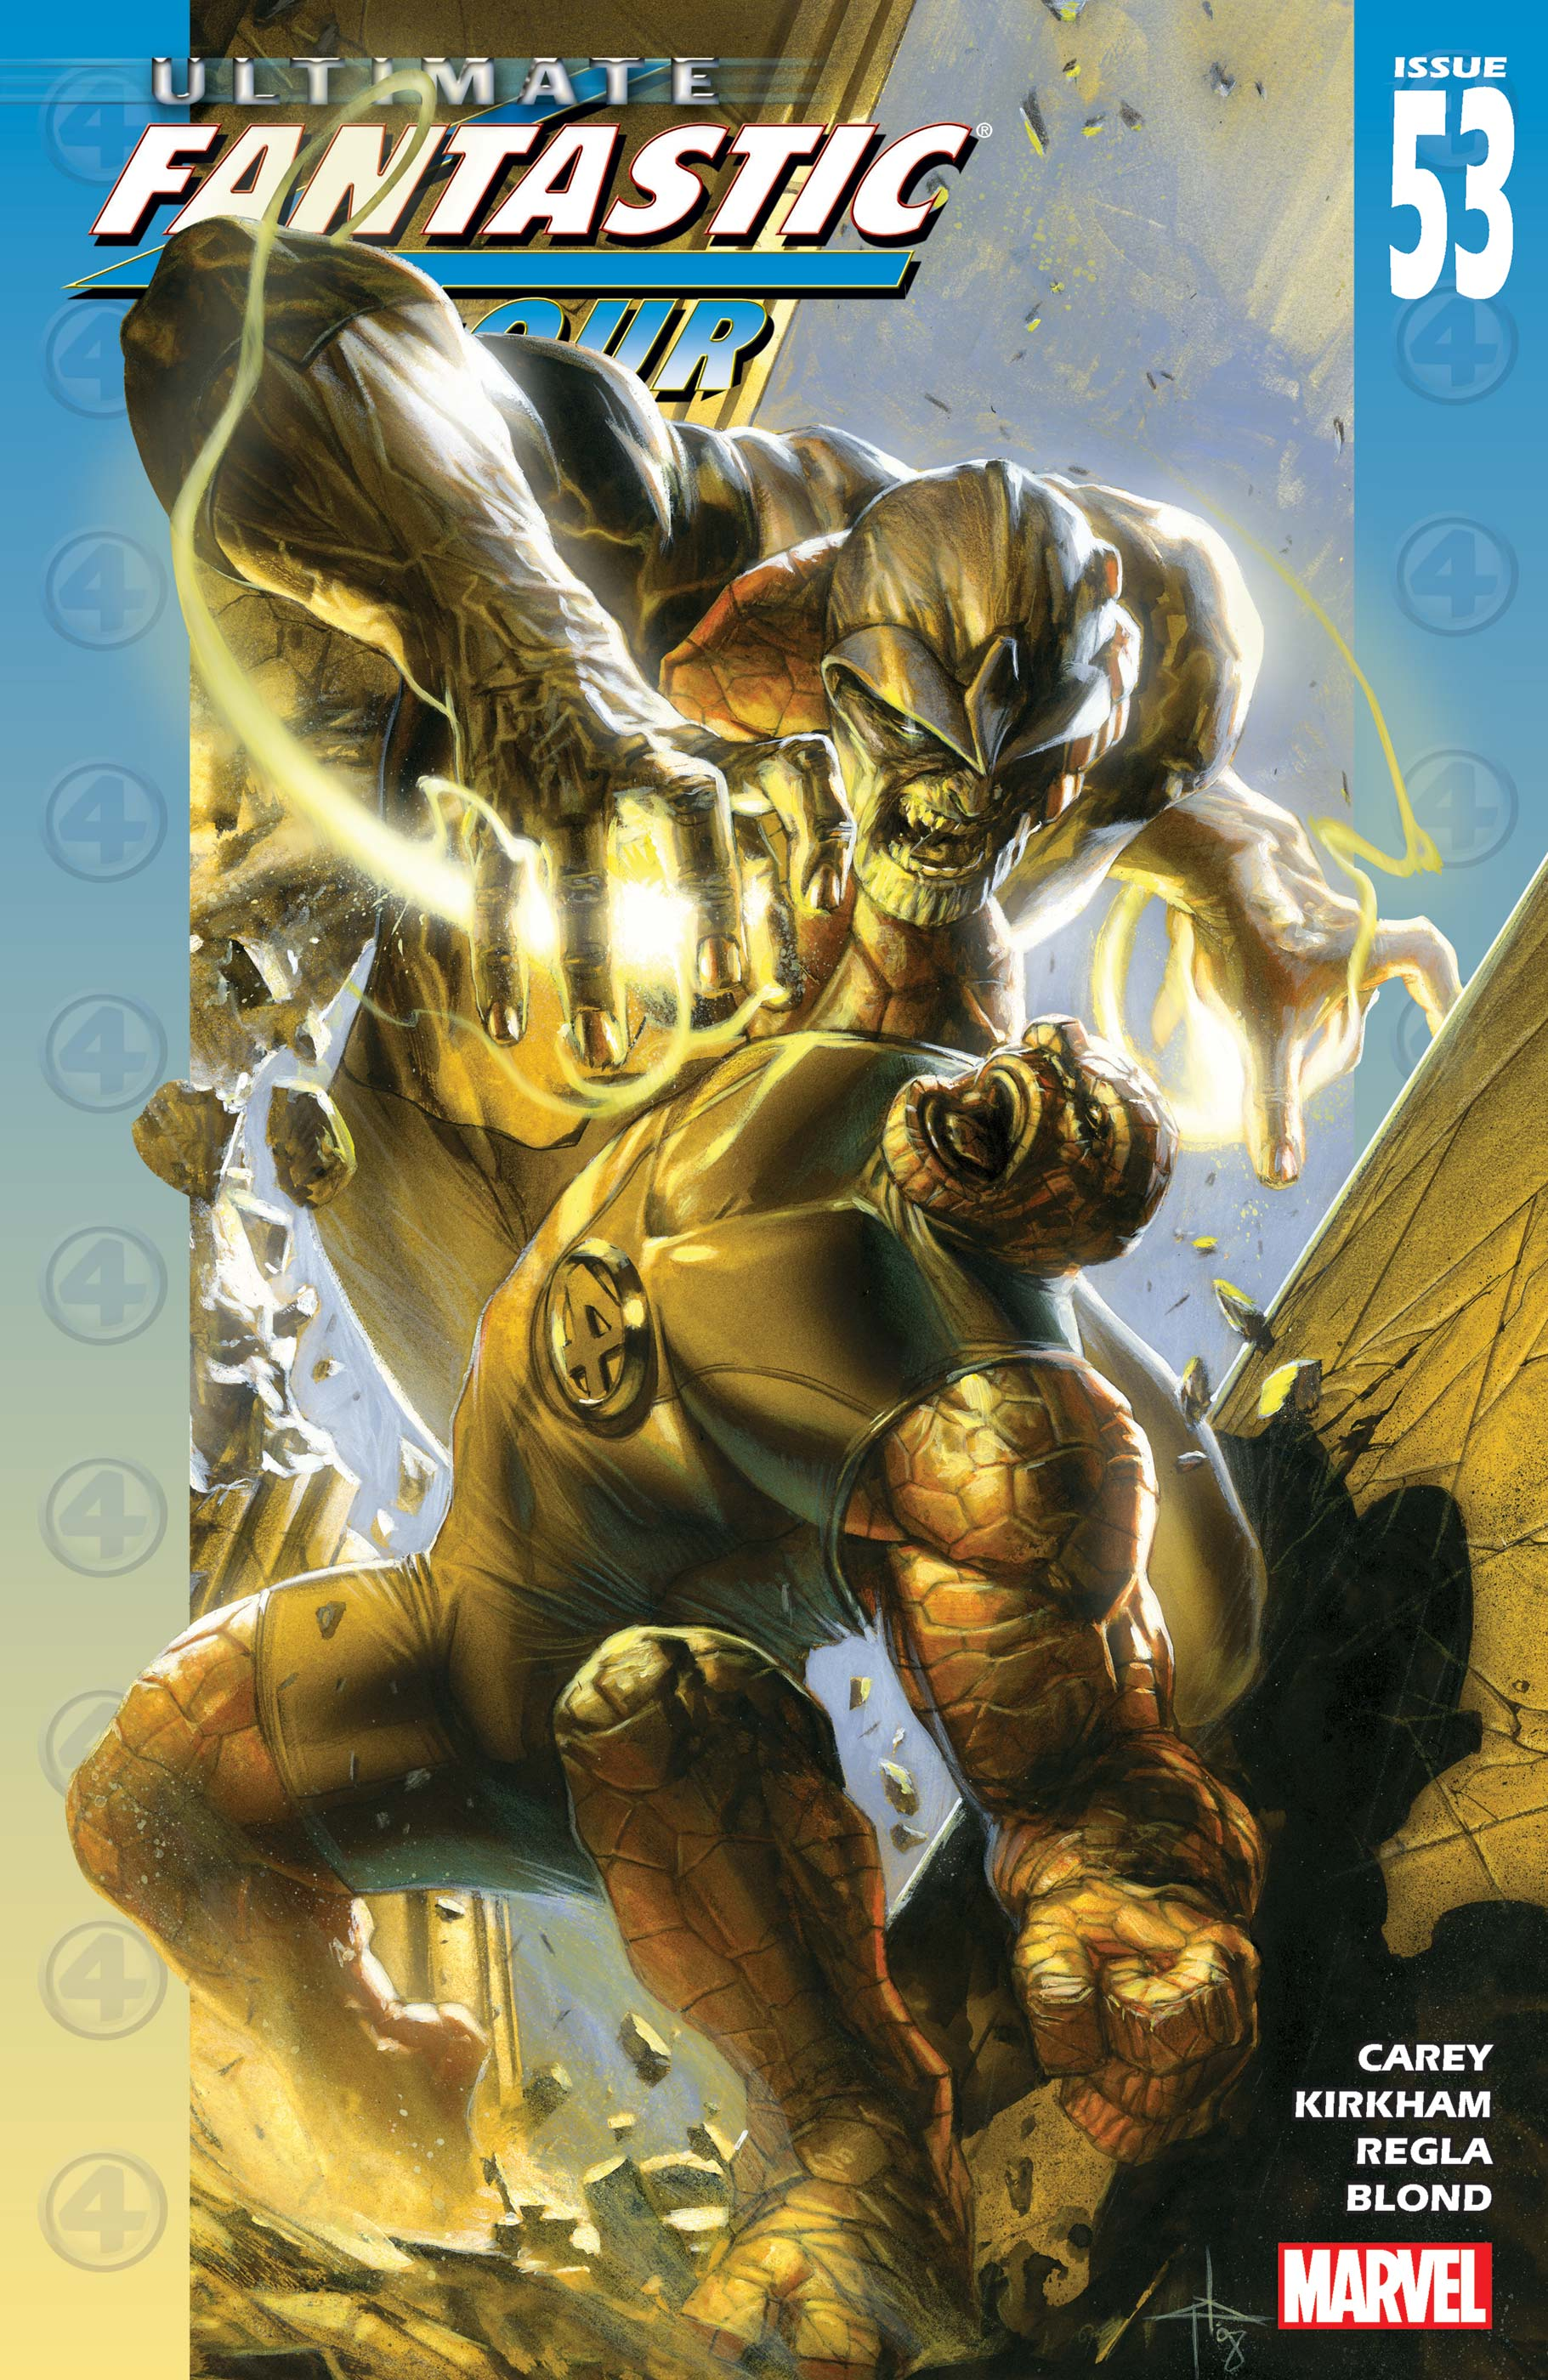 Ultimate Fantastic Four (2003) #53